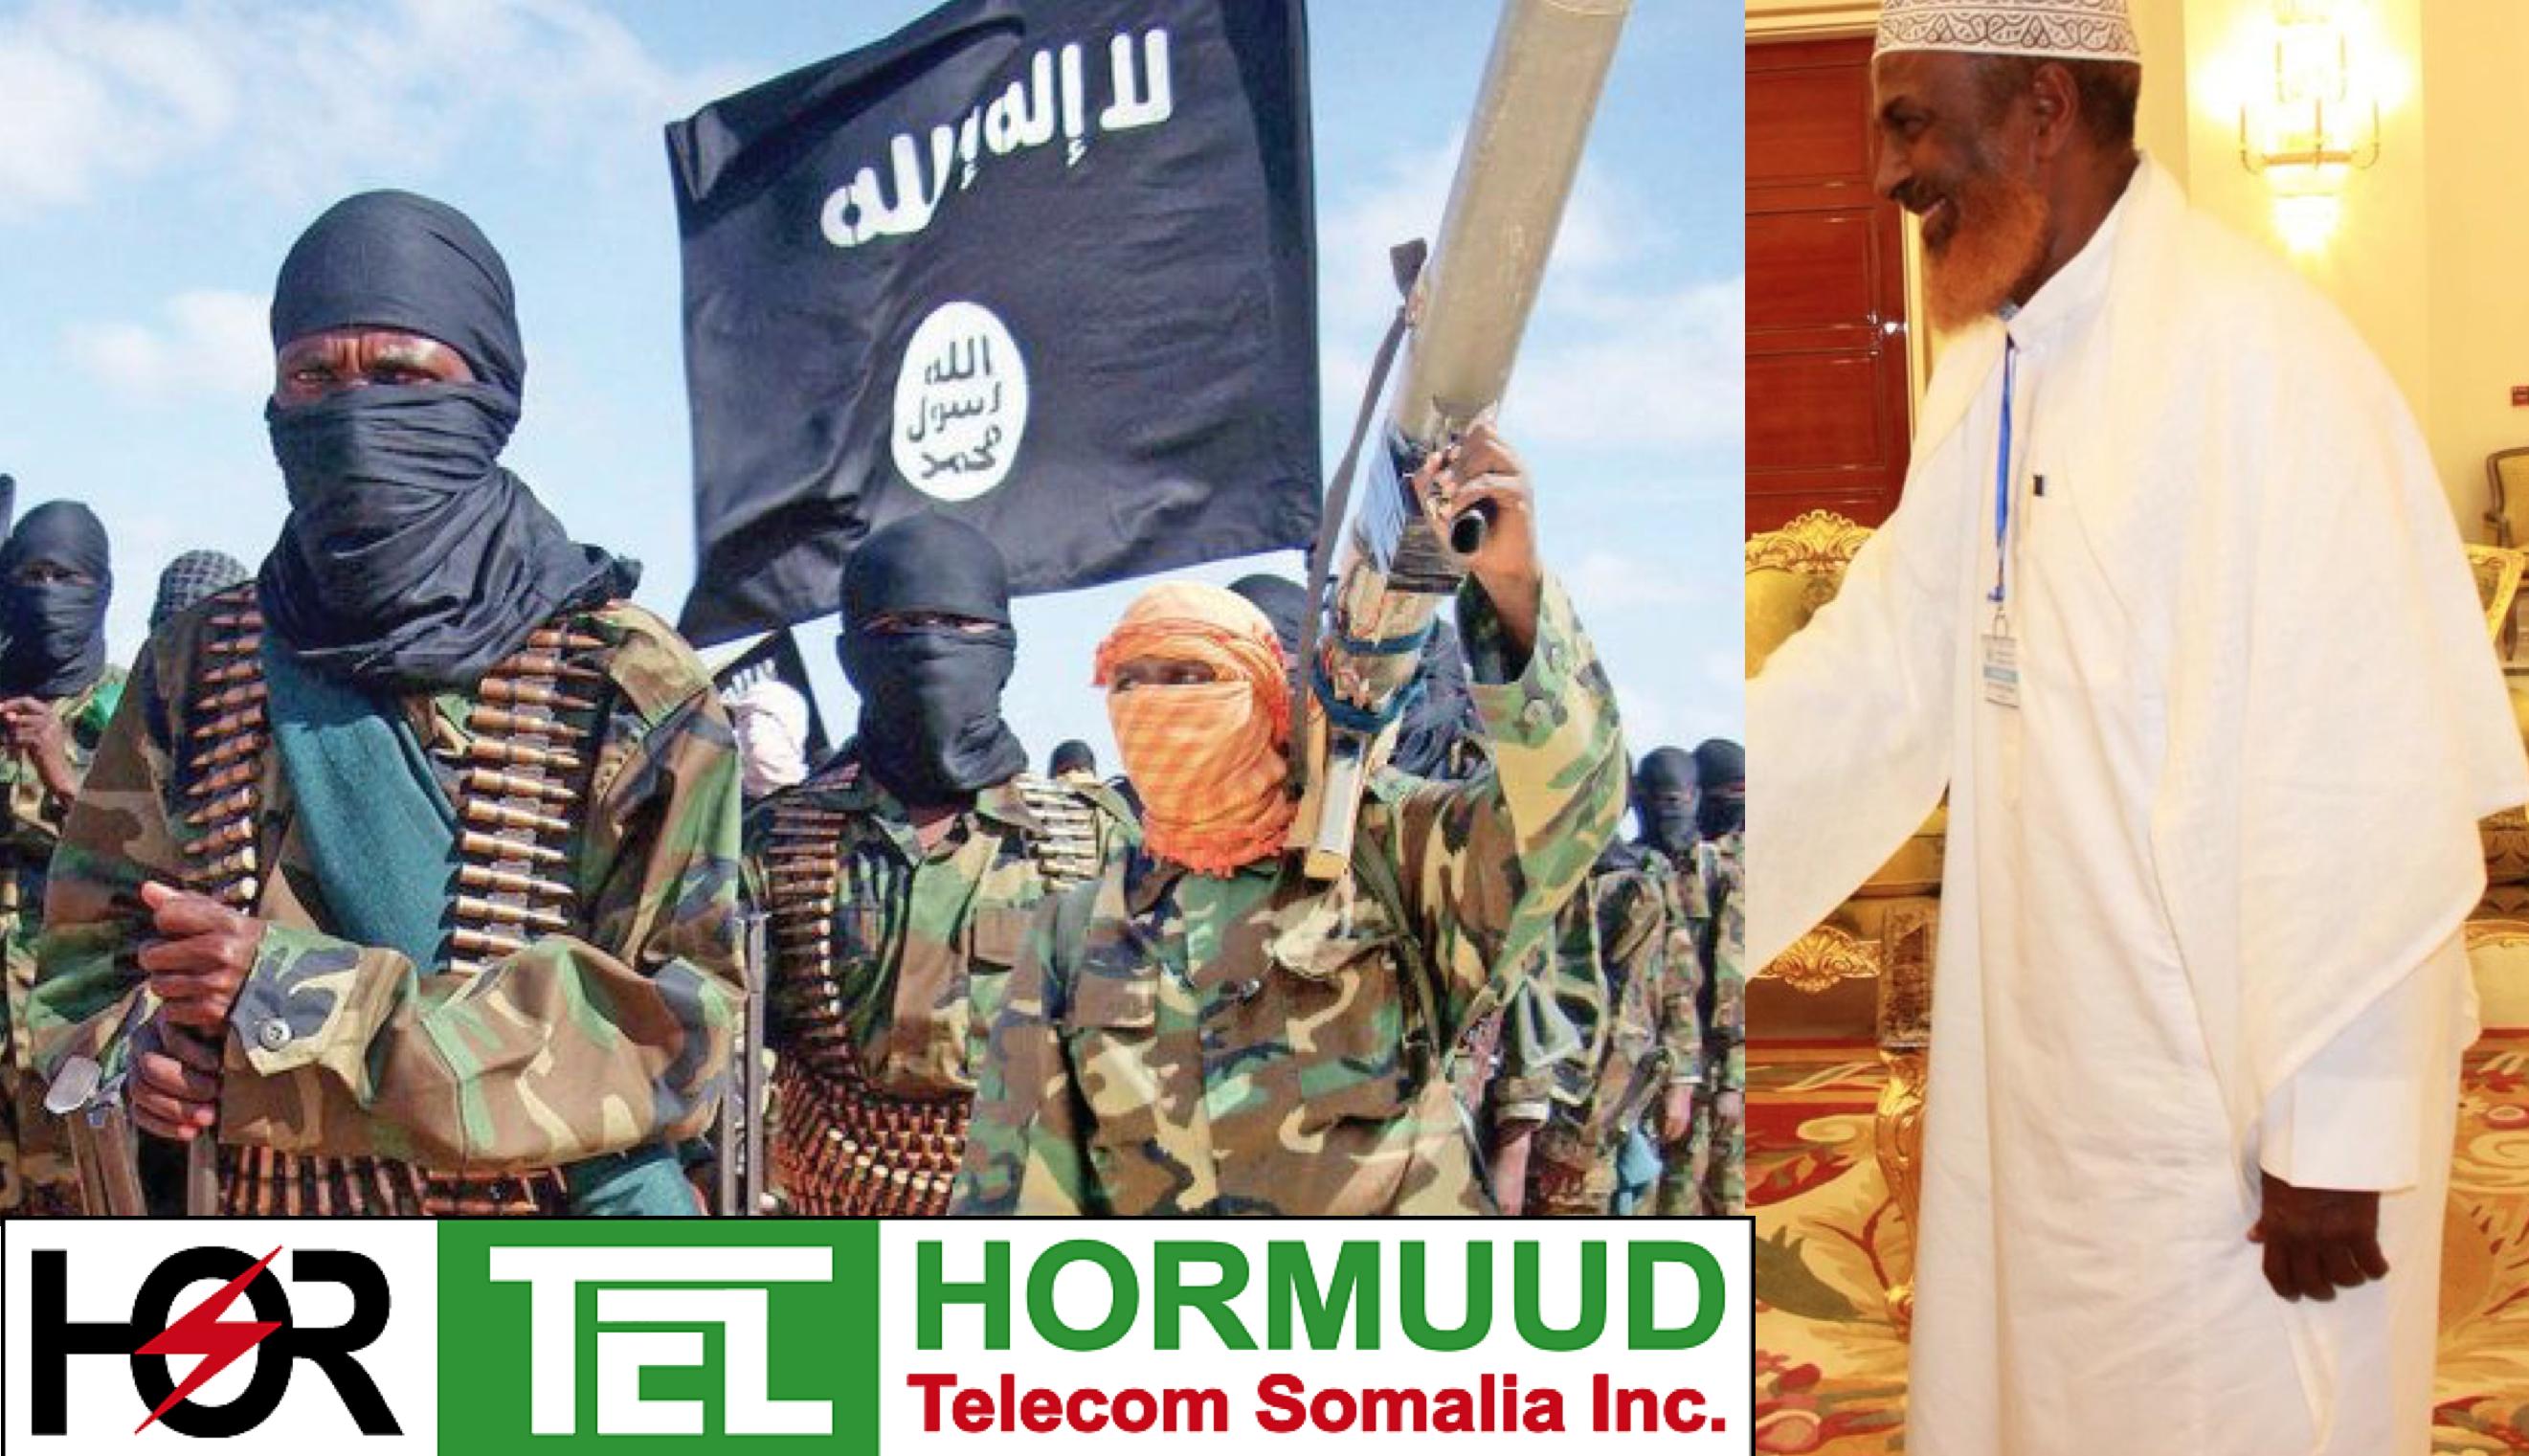 [Topnews Xog sira:] Hormuud Telecom ma shirkad ganacsiyaa mise?